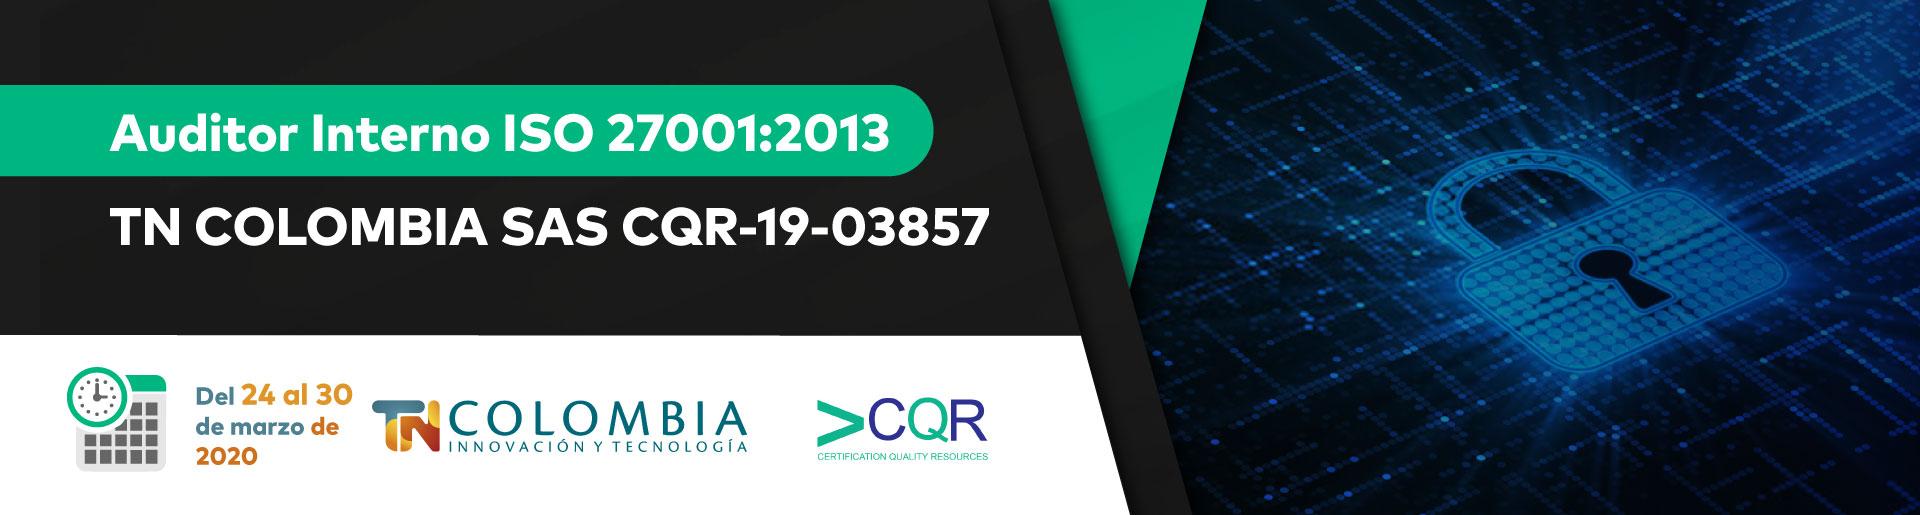 Auditor Interno ISO 27001 CQR cotecna